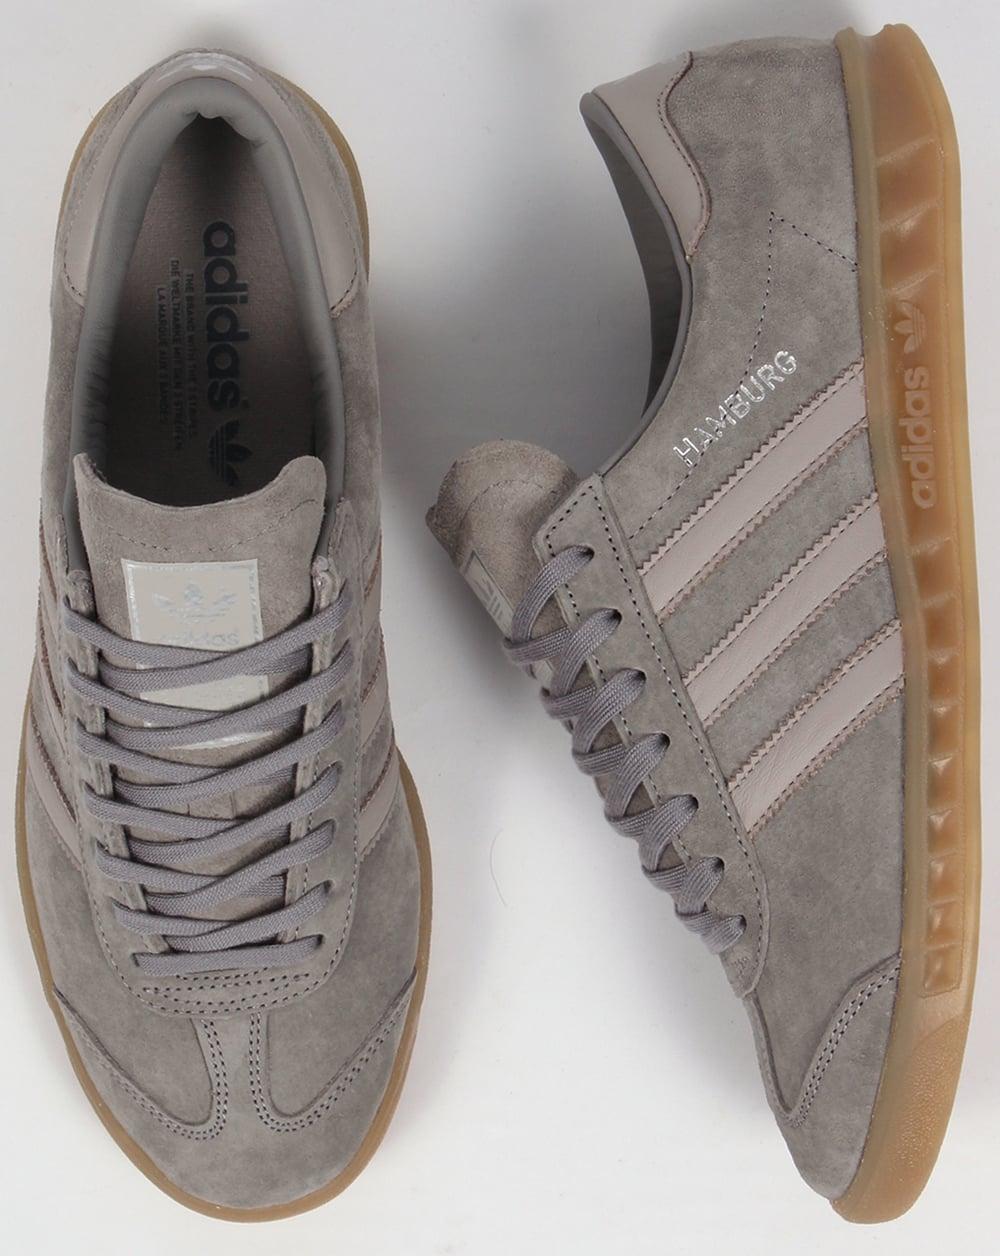 timeless design 86c53 5cfa6 Adidas Hamburg Trainers Granite Grey